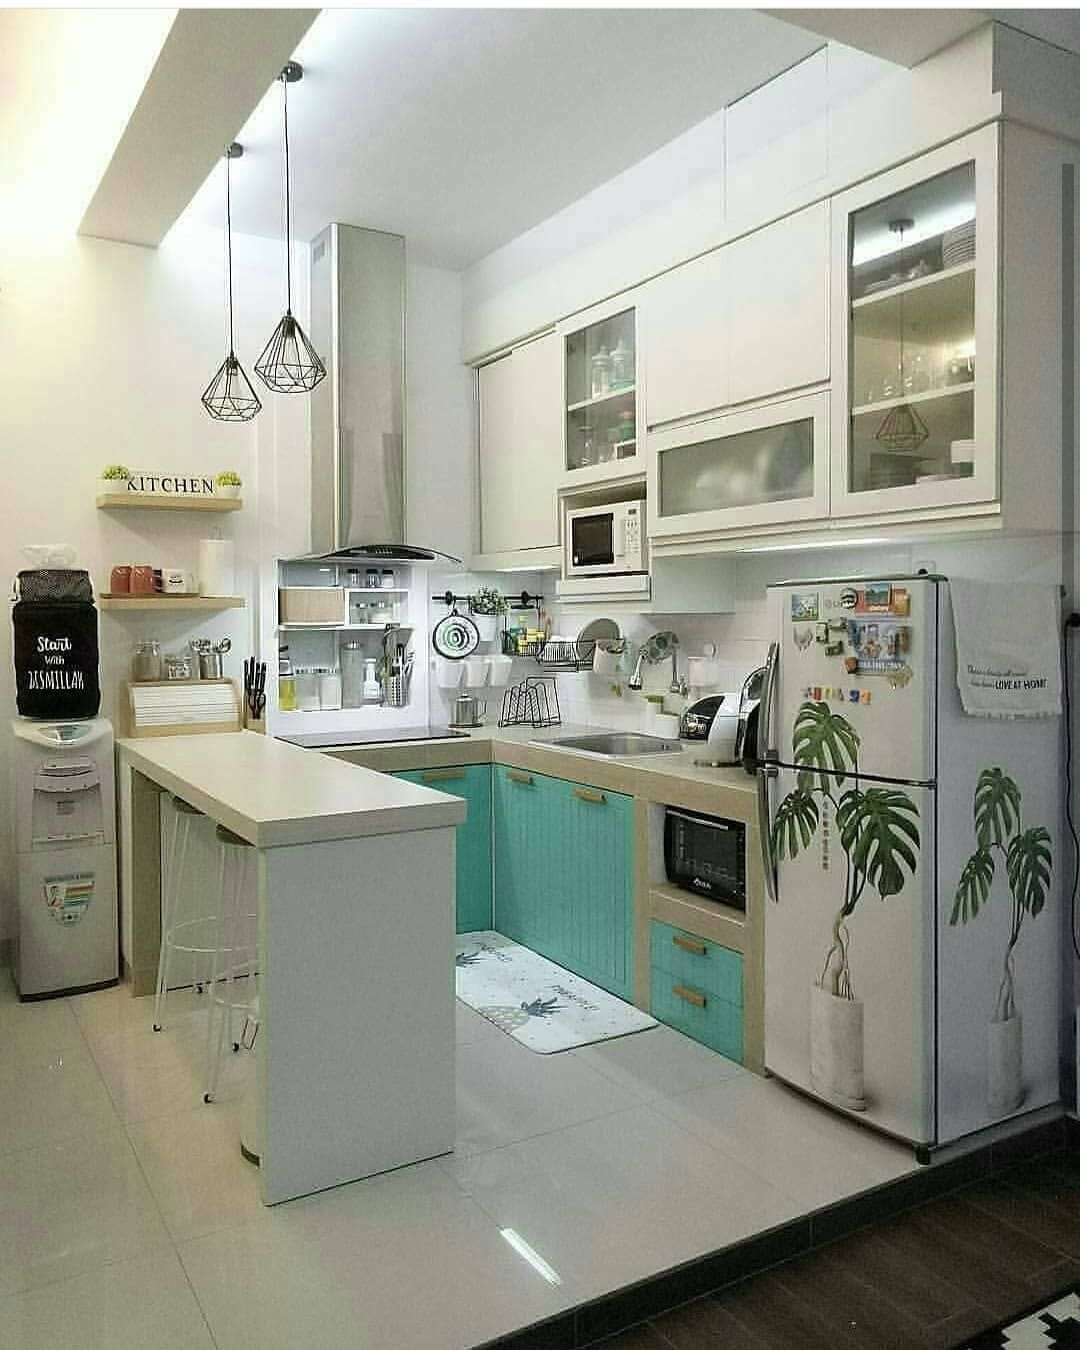 Rumah cantik by @thenugrohouse . Semoga menginspirasi ????????❤️ --- Double Tap ❤ dan Tag ke teman/pasanganmu???? --- #rumahrumahcantik…